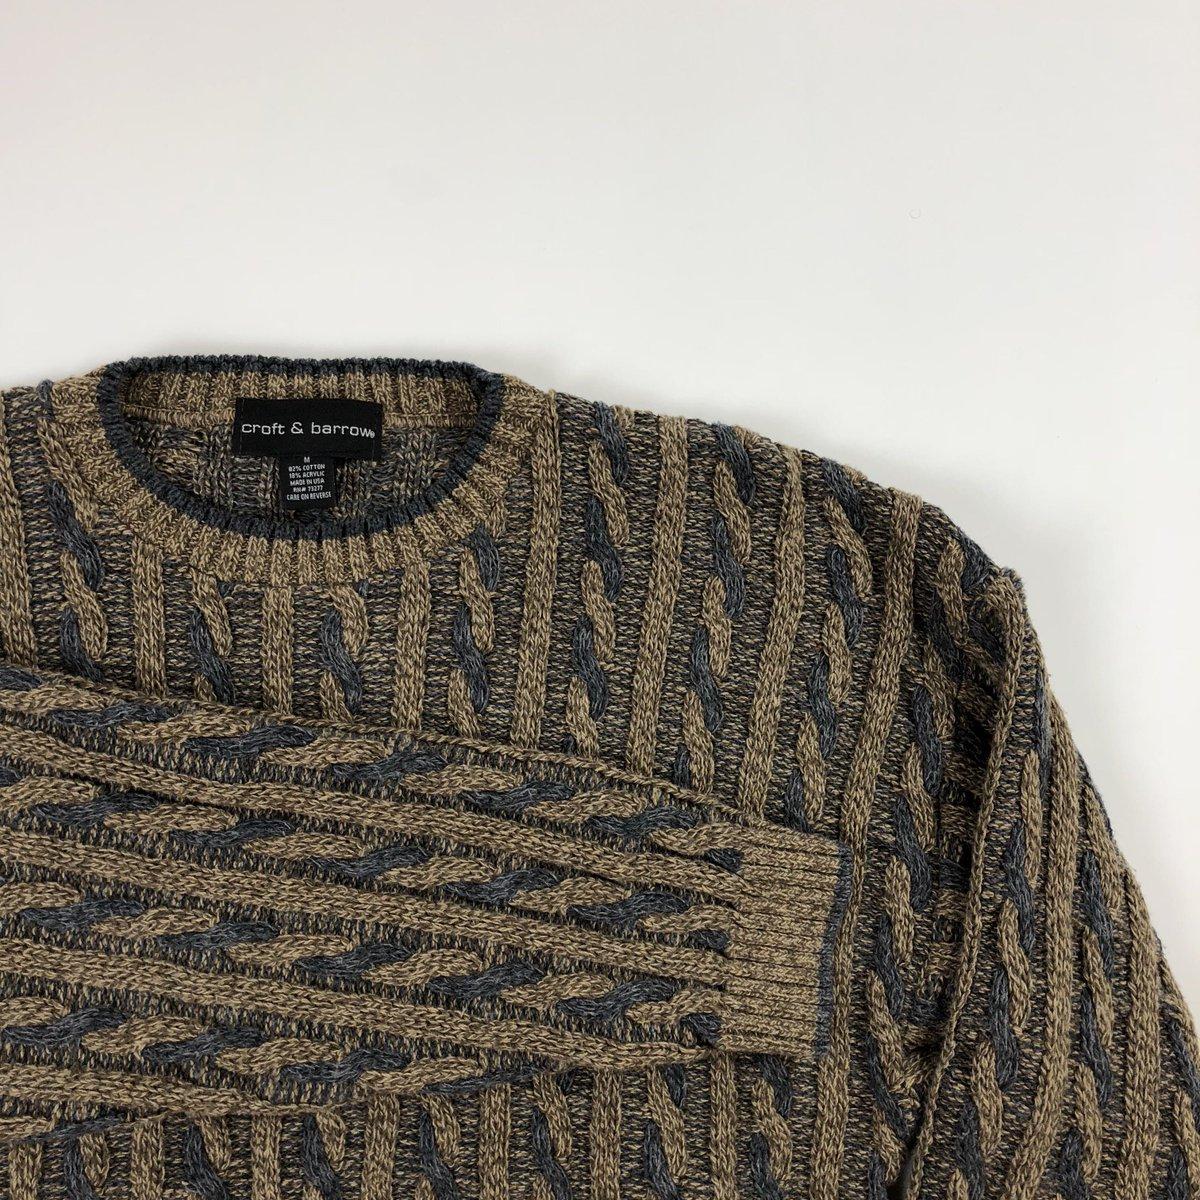 5779cec167b ... any questions  vintageclothes  streetwearshop  art  fashionstartup   depop  supreme  sweaterweather  cozyseason  cableknit  pic.twitter.com dOGREEejDd